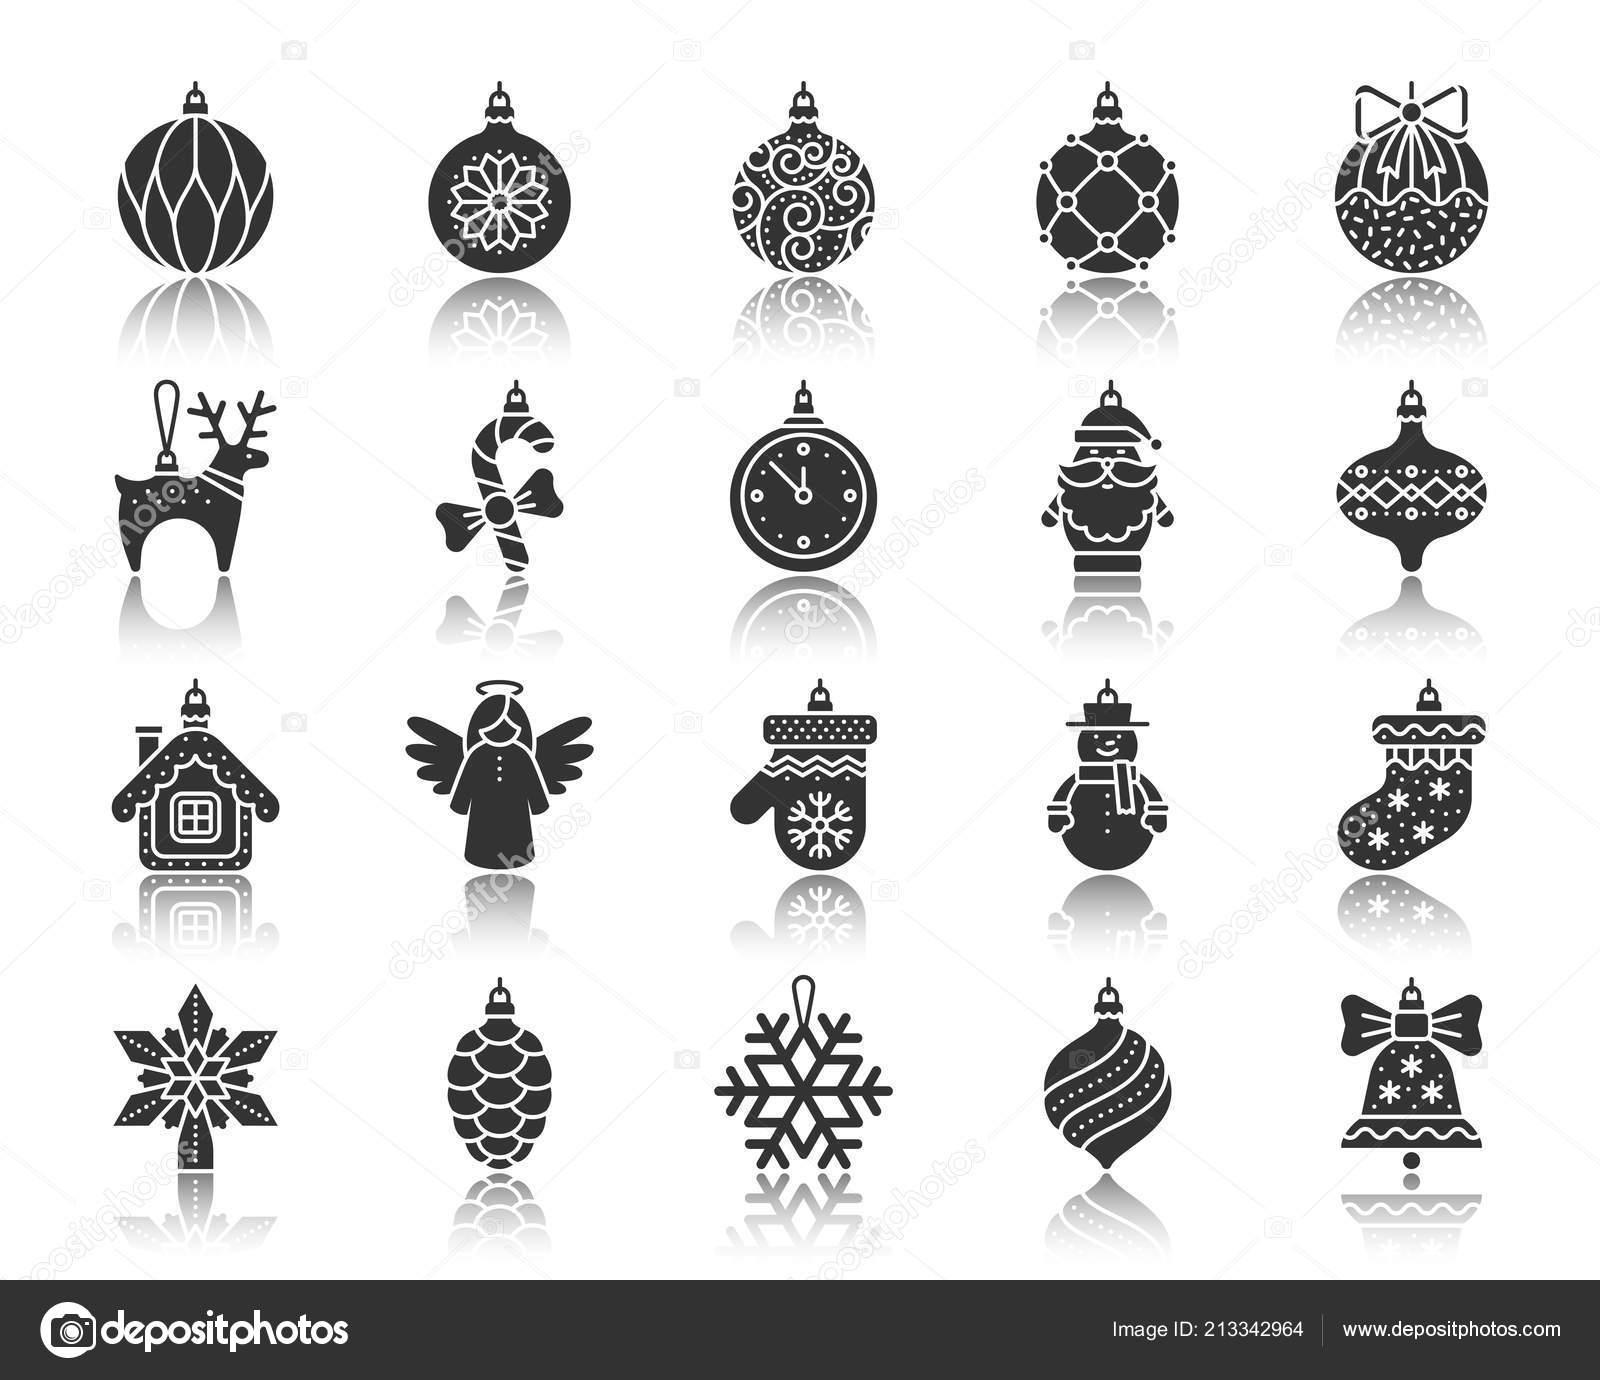 Hanging Christmas Ornaments Silhouette.Xmas Tree Decor Black Silhouette Icons Vector Set Stock